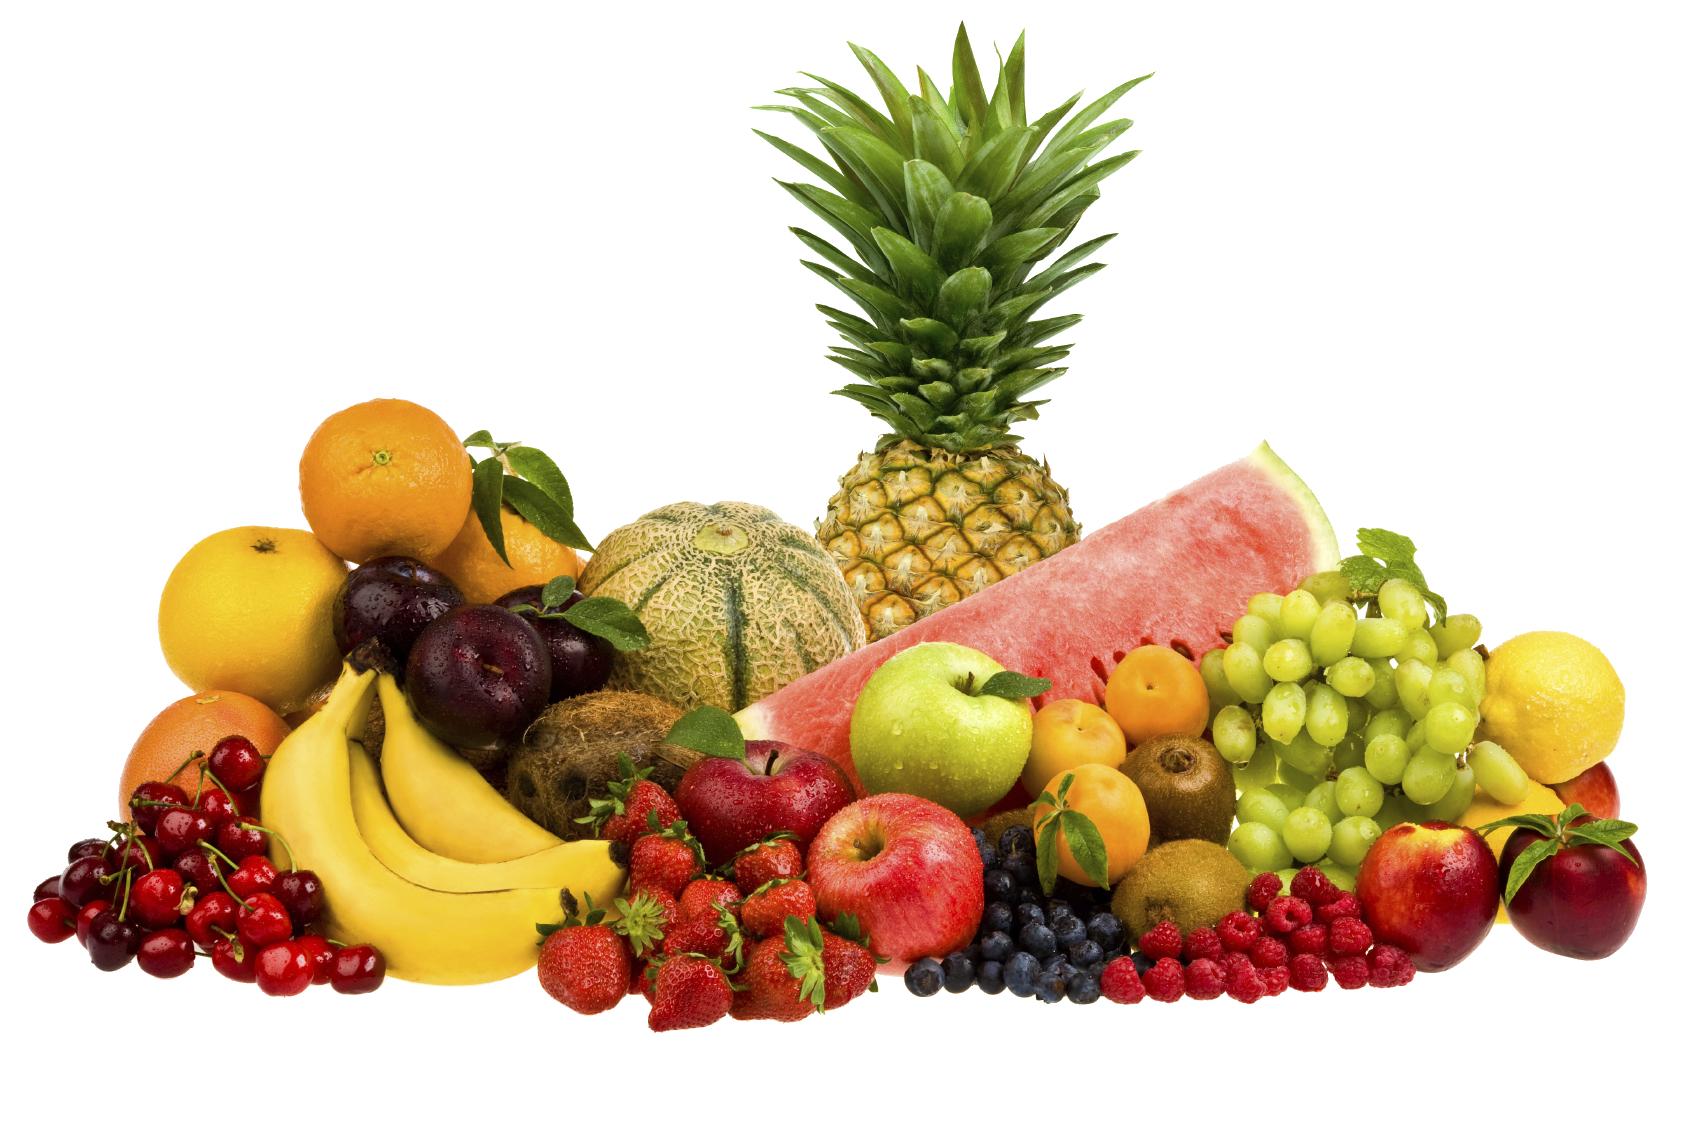 fruits medicine for diabetes